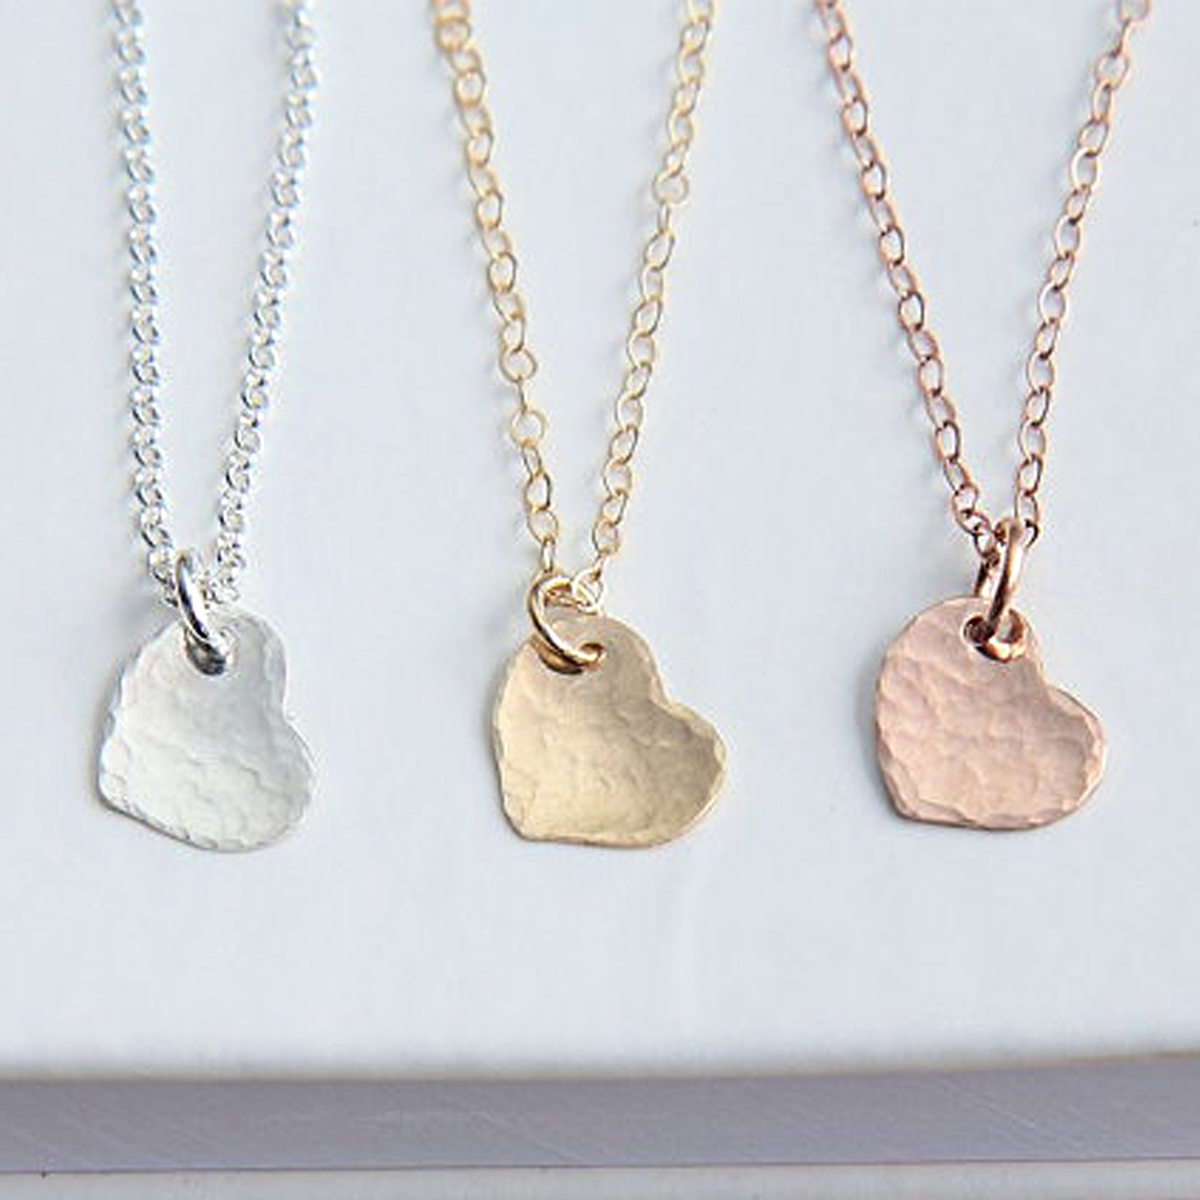 Women's Girls Charming Love Heart Pendant Necklace Rose ...